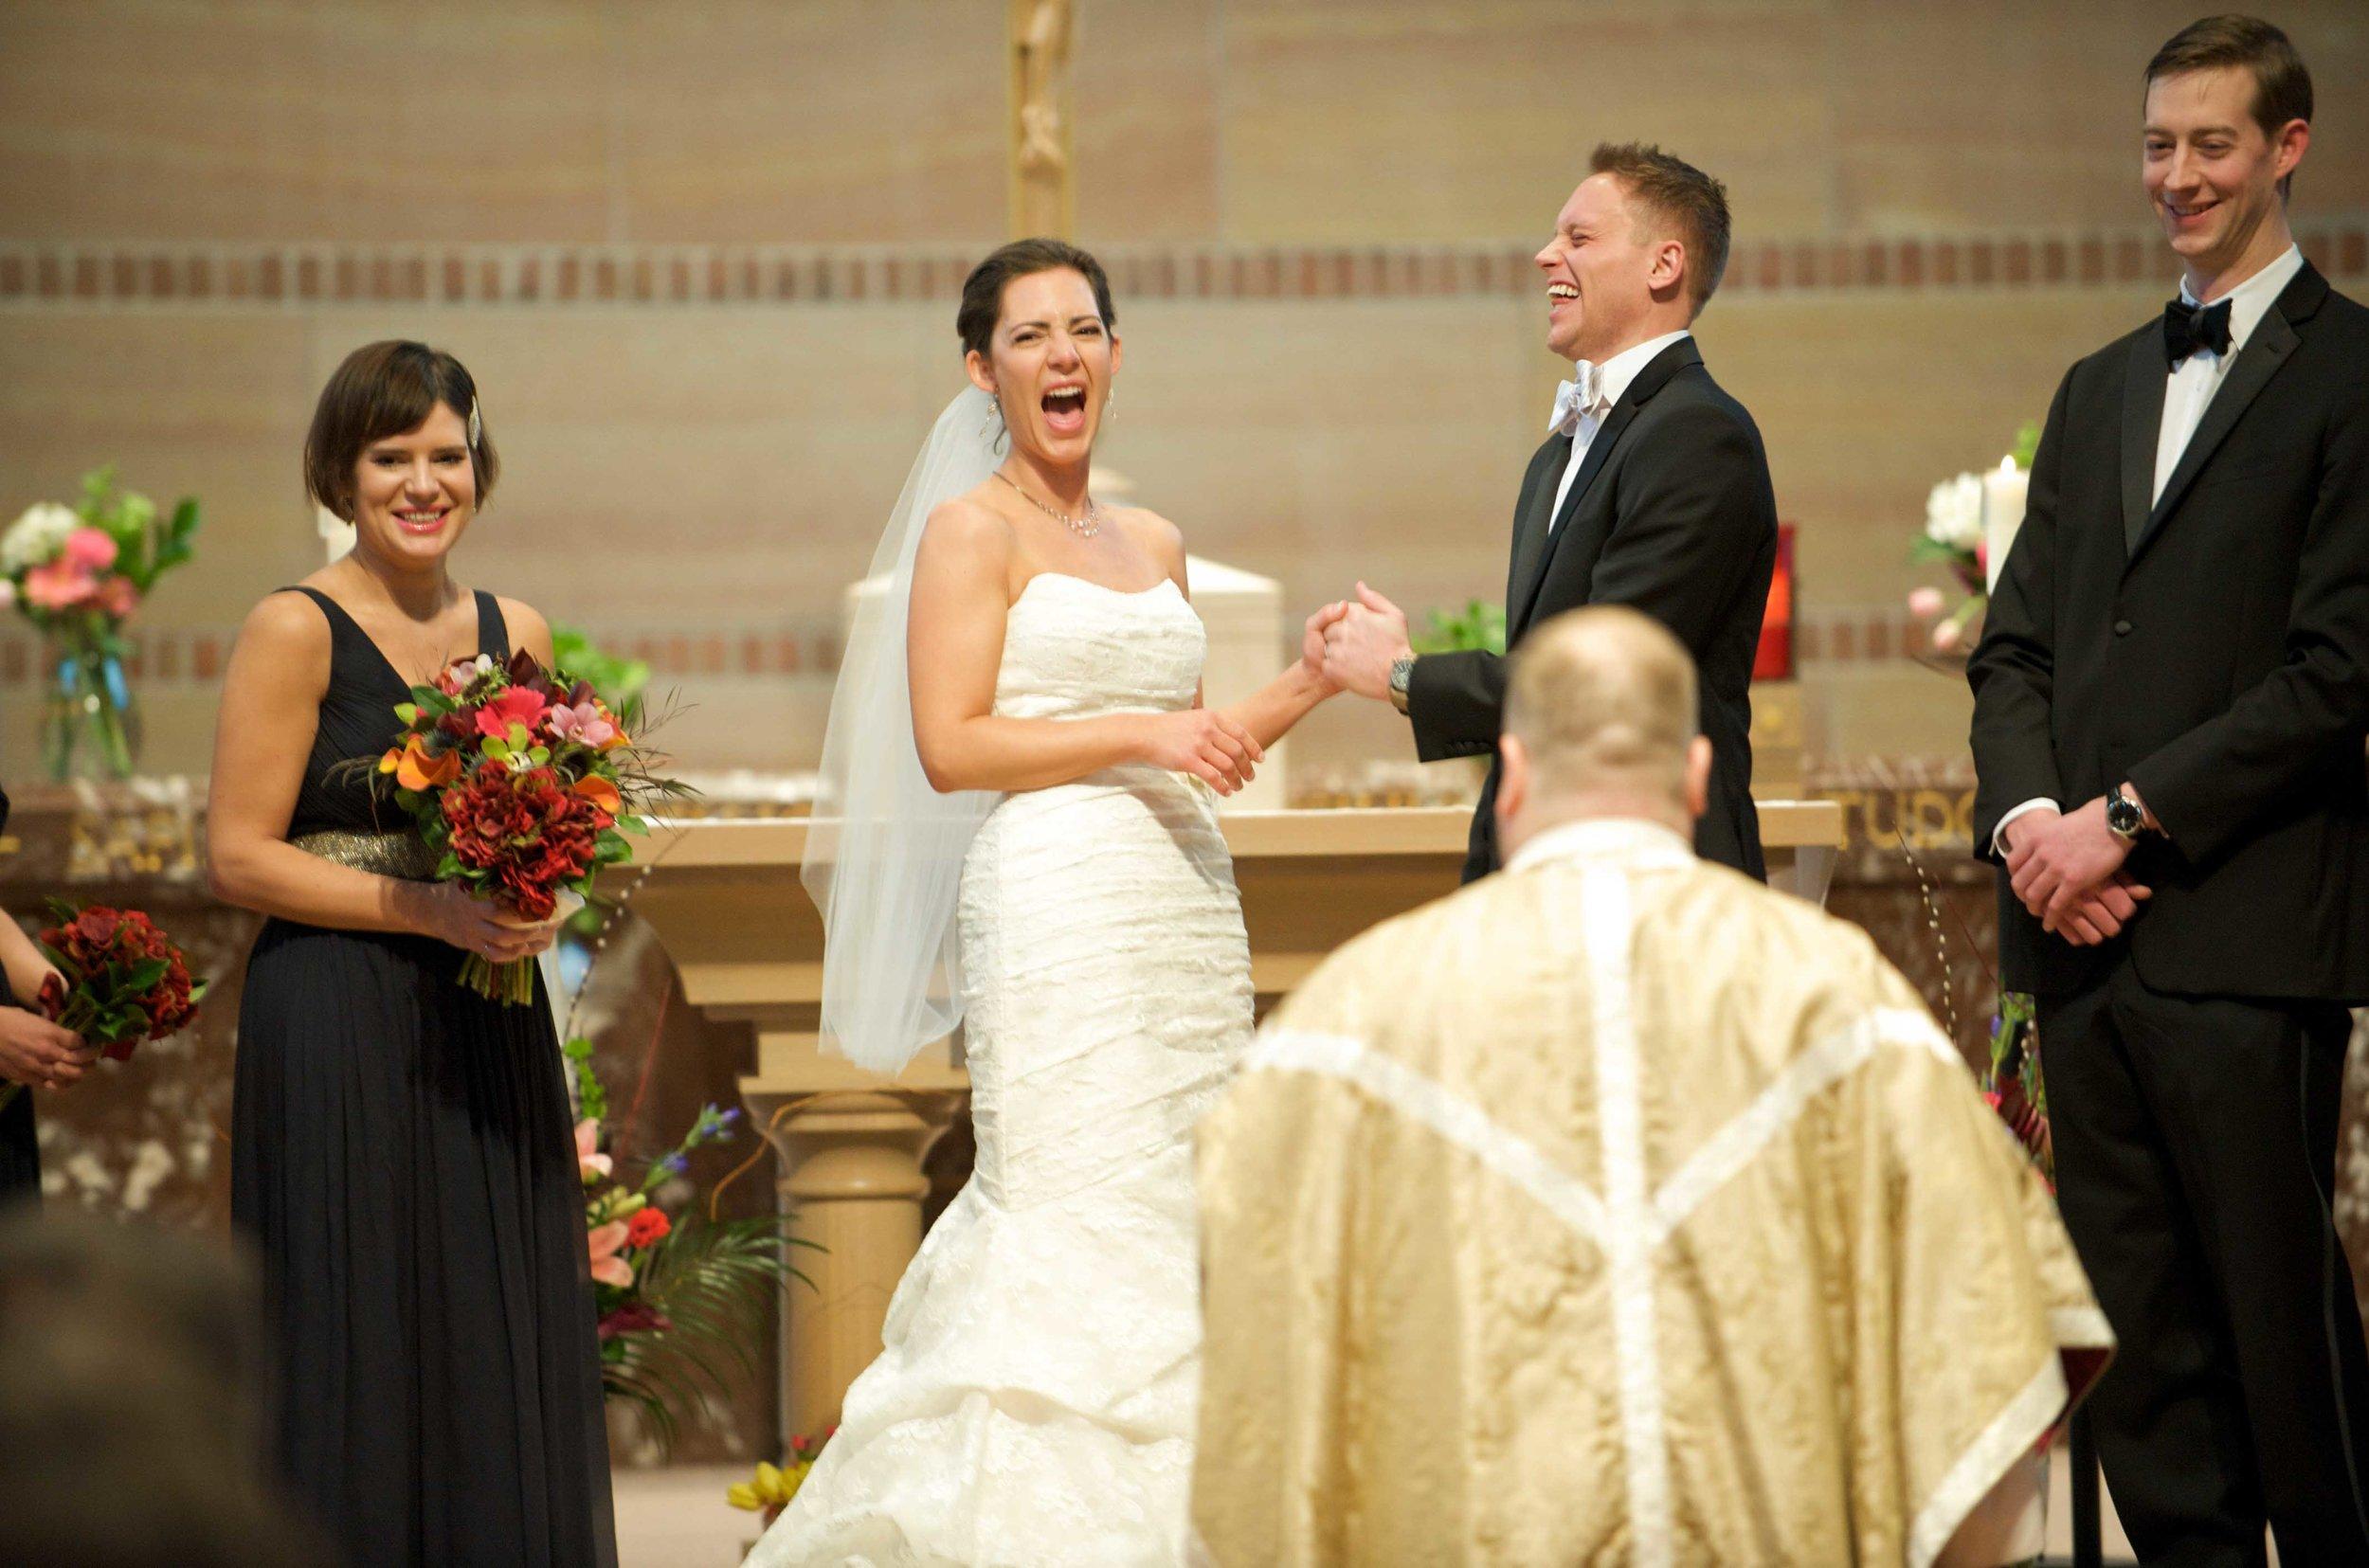 wedding photography minneapolis mn